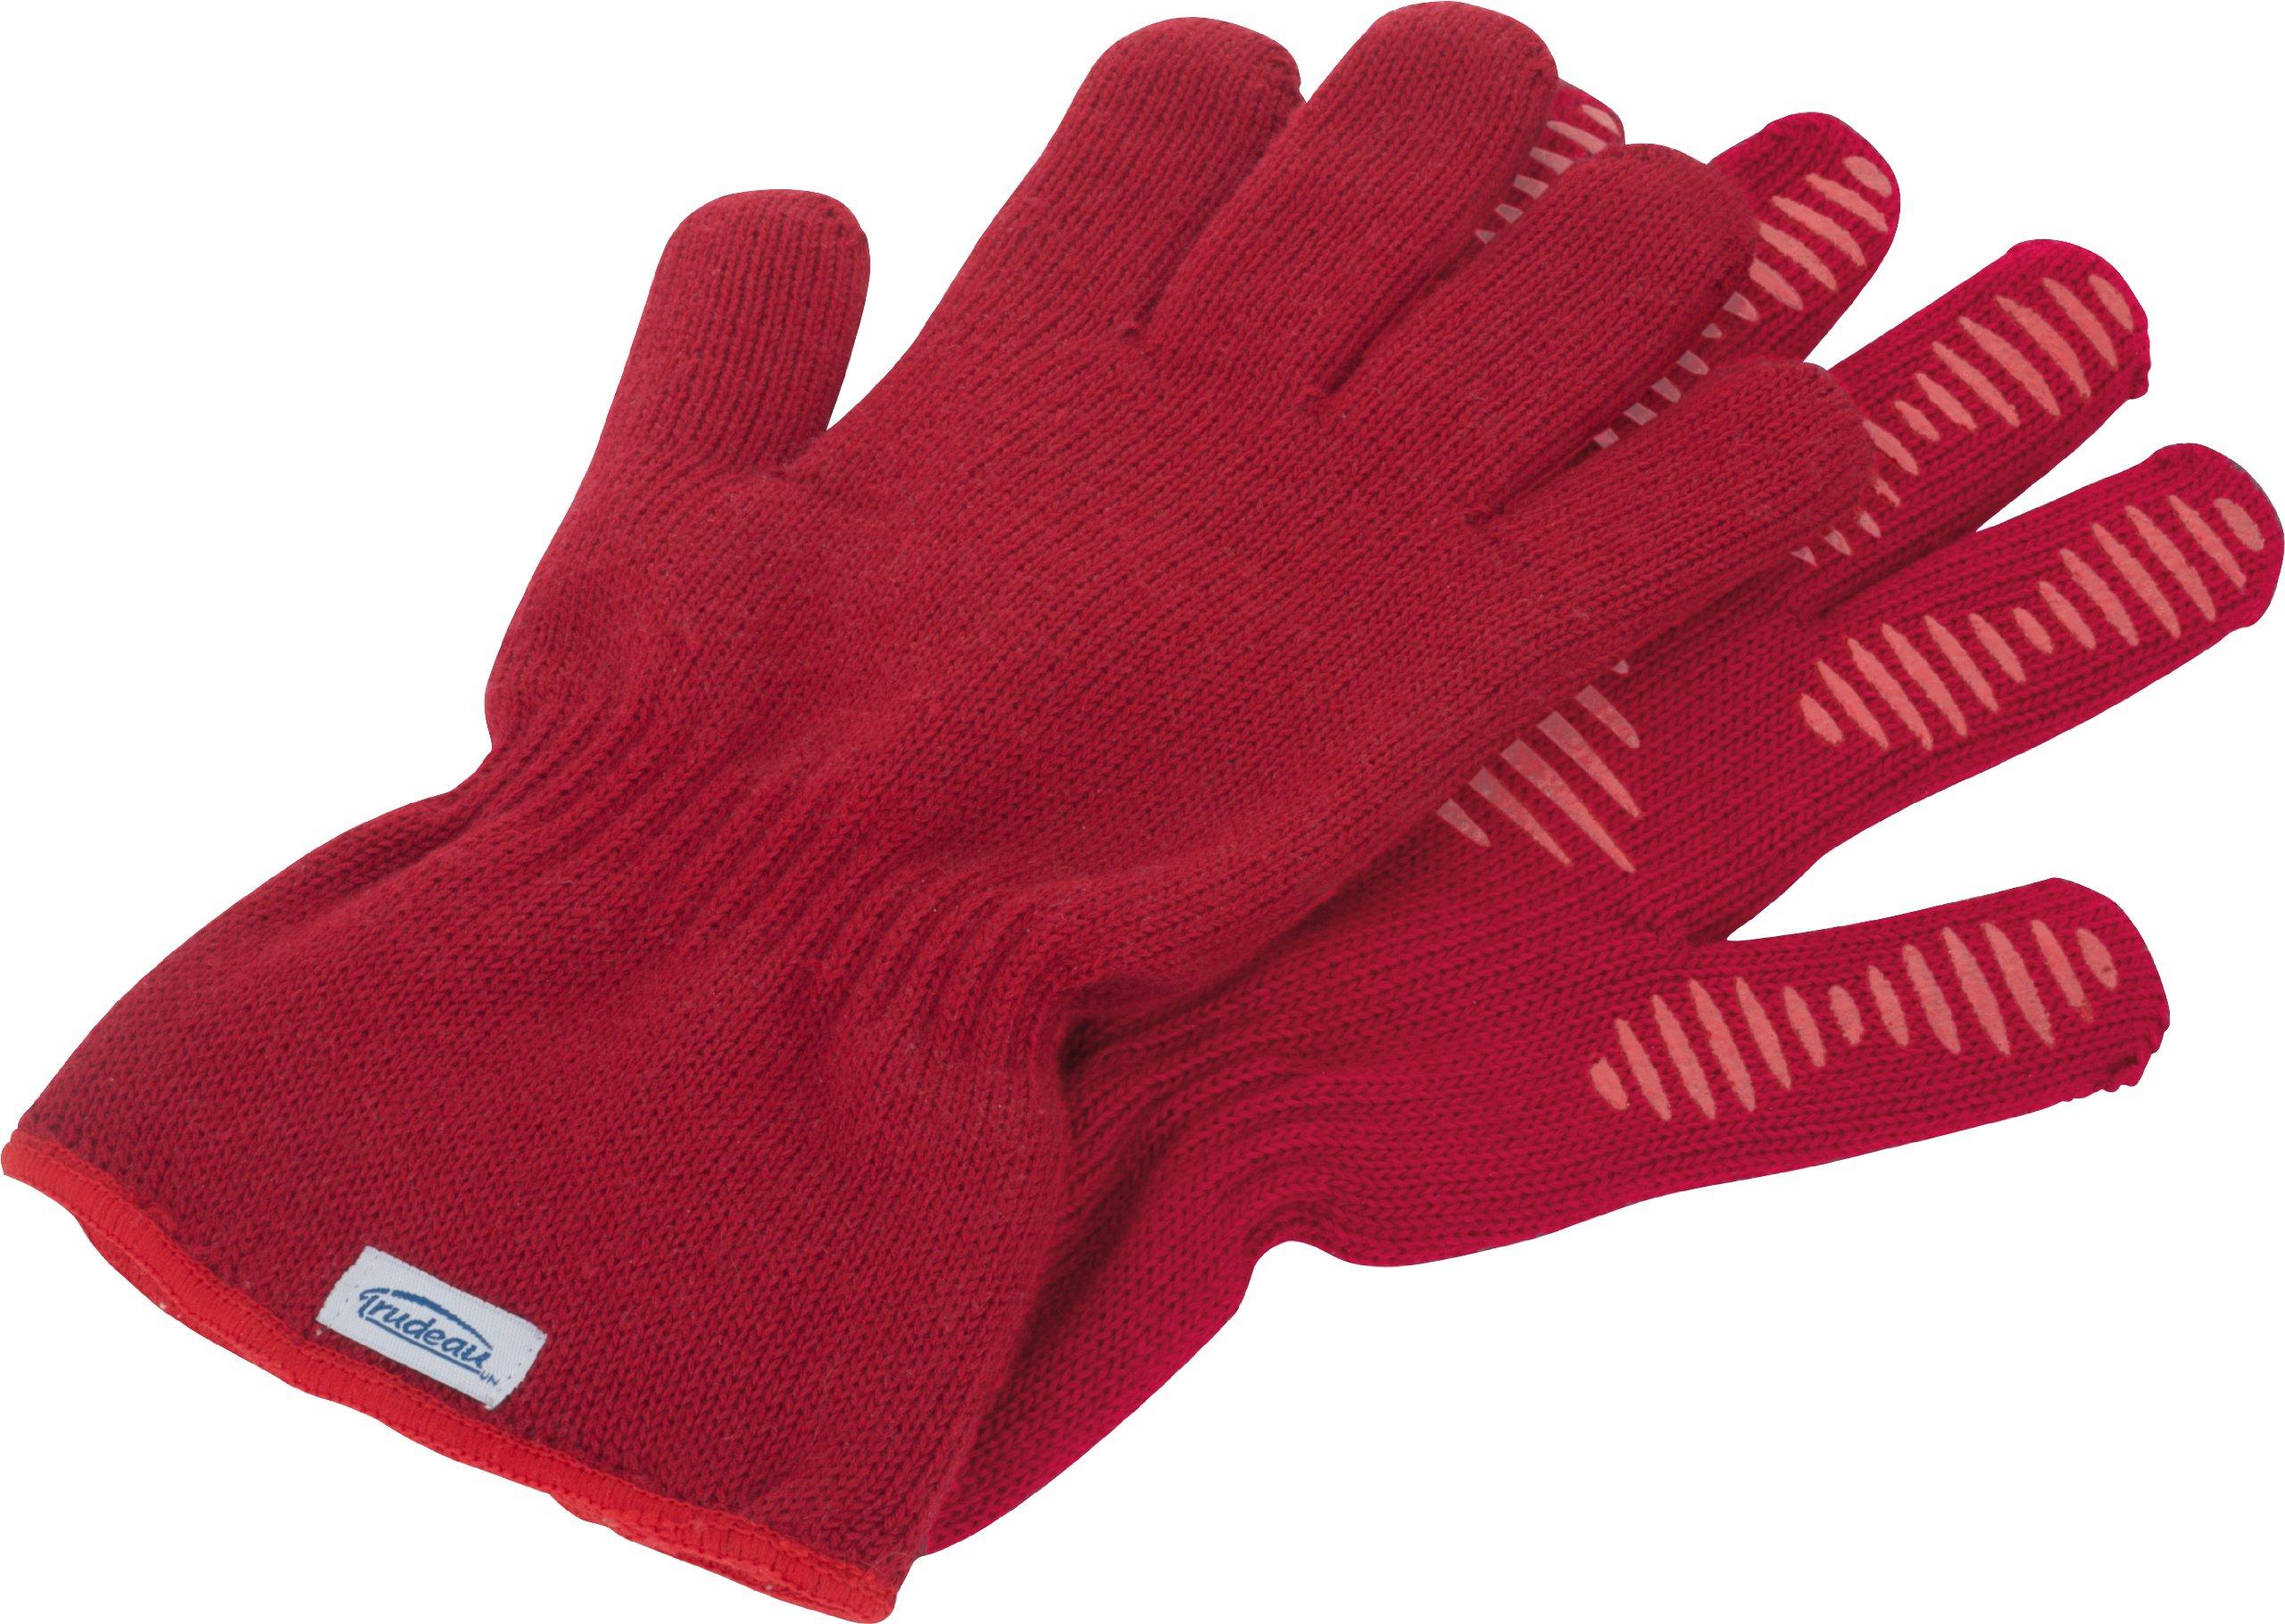 Trudeau 09911024 Kitchen Gloves, M-L, Red by Trudeau